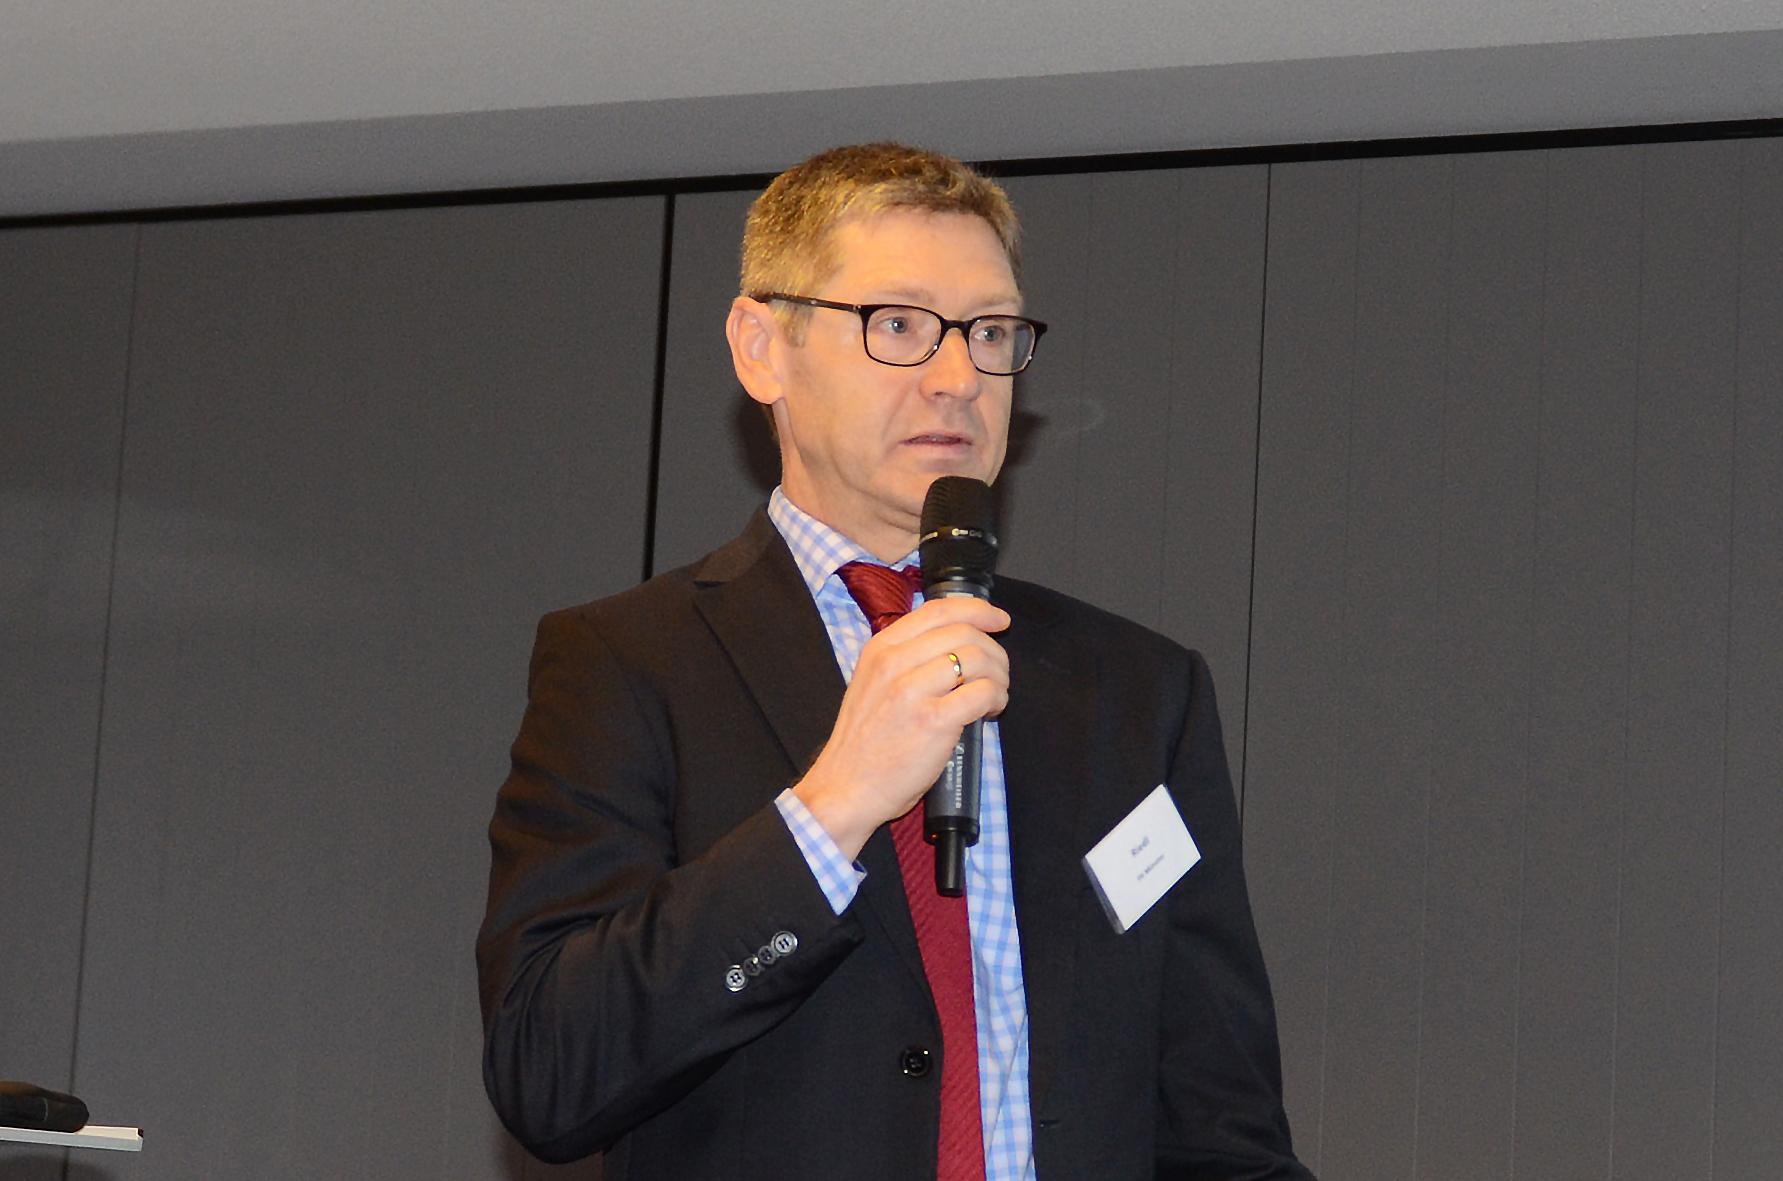 Prof. Dr. Alexander Riedl